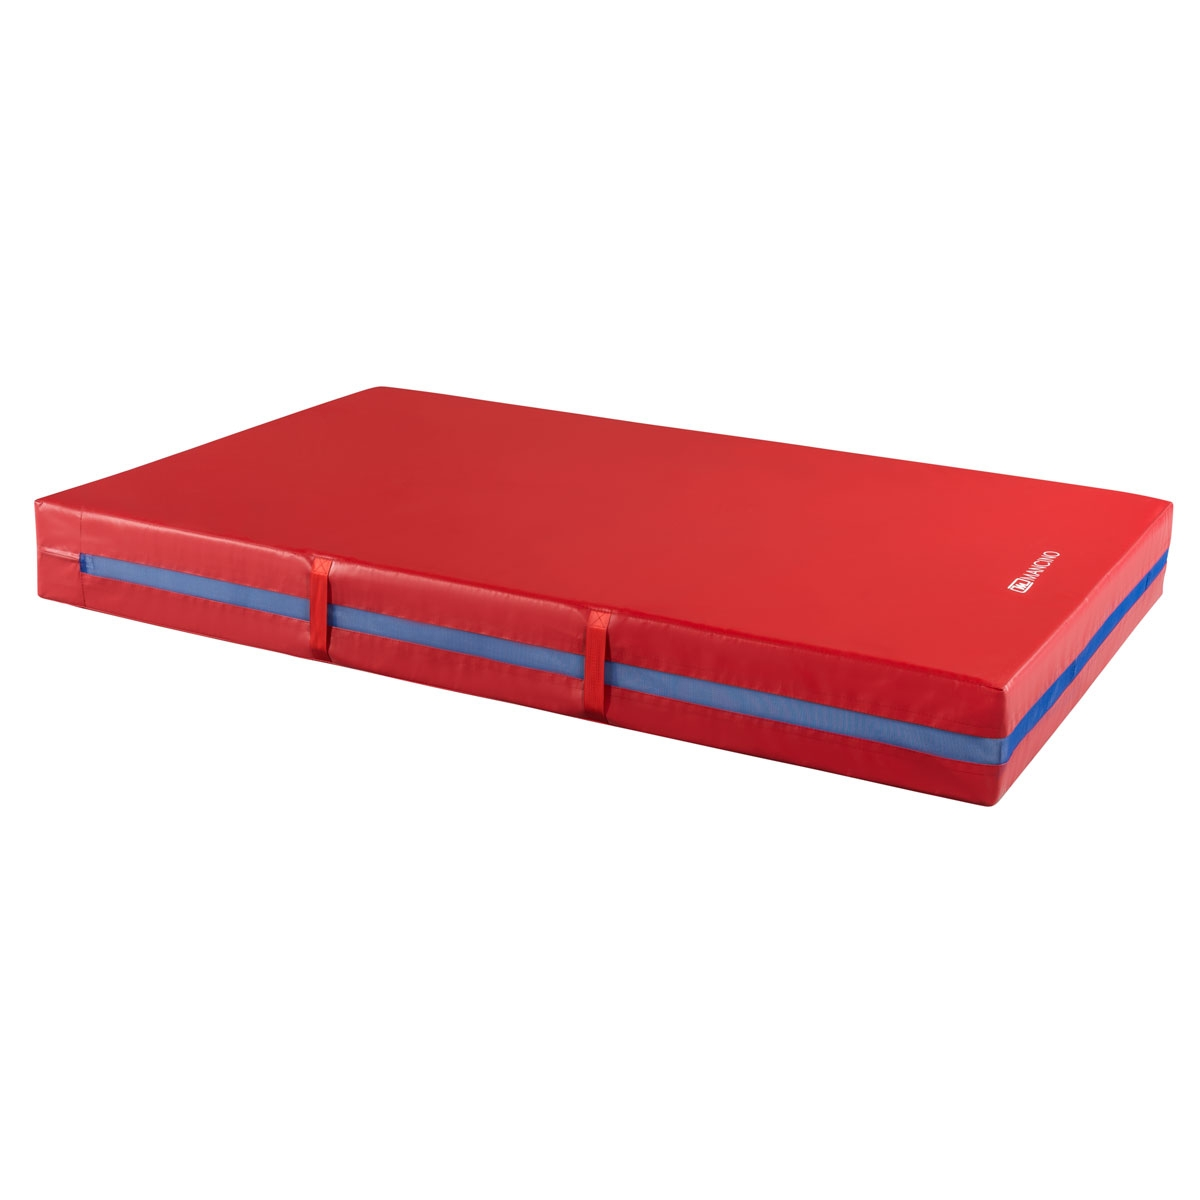 8 incher landing mat skill cushion red   mancino mats